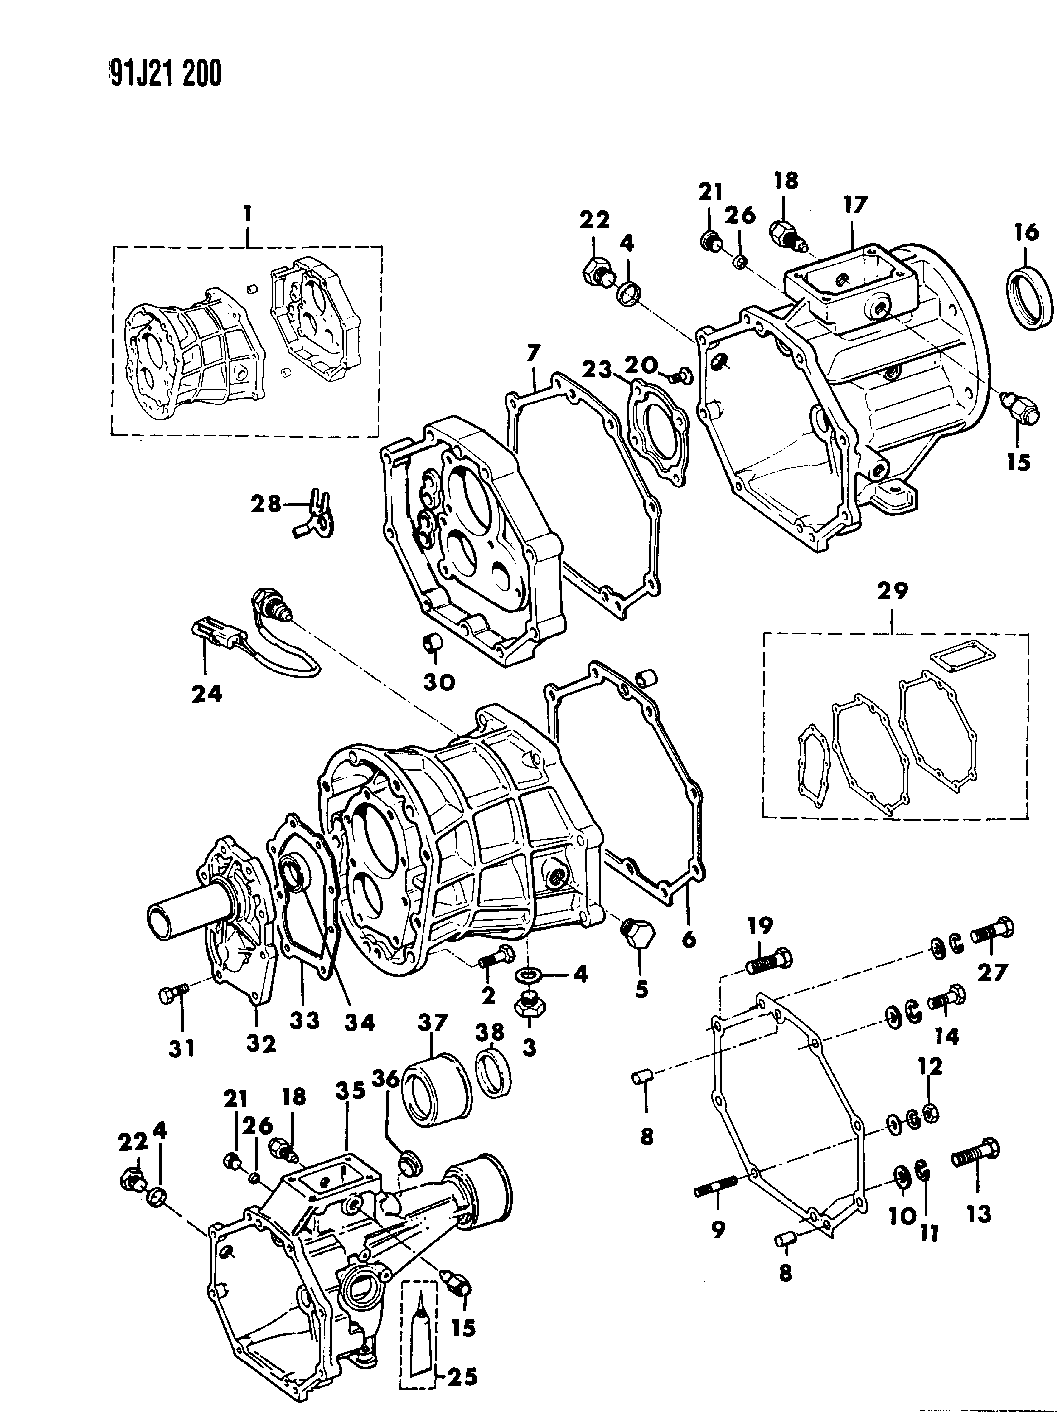 1991 Jeep Wrangler Case Extension Miscellaneous Parts Engine Diagram Thumbnail 1